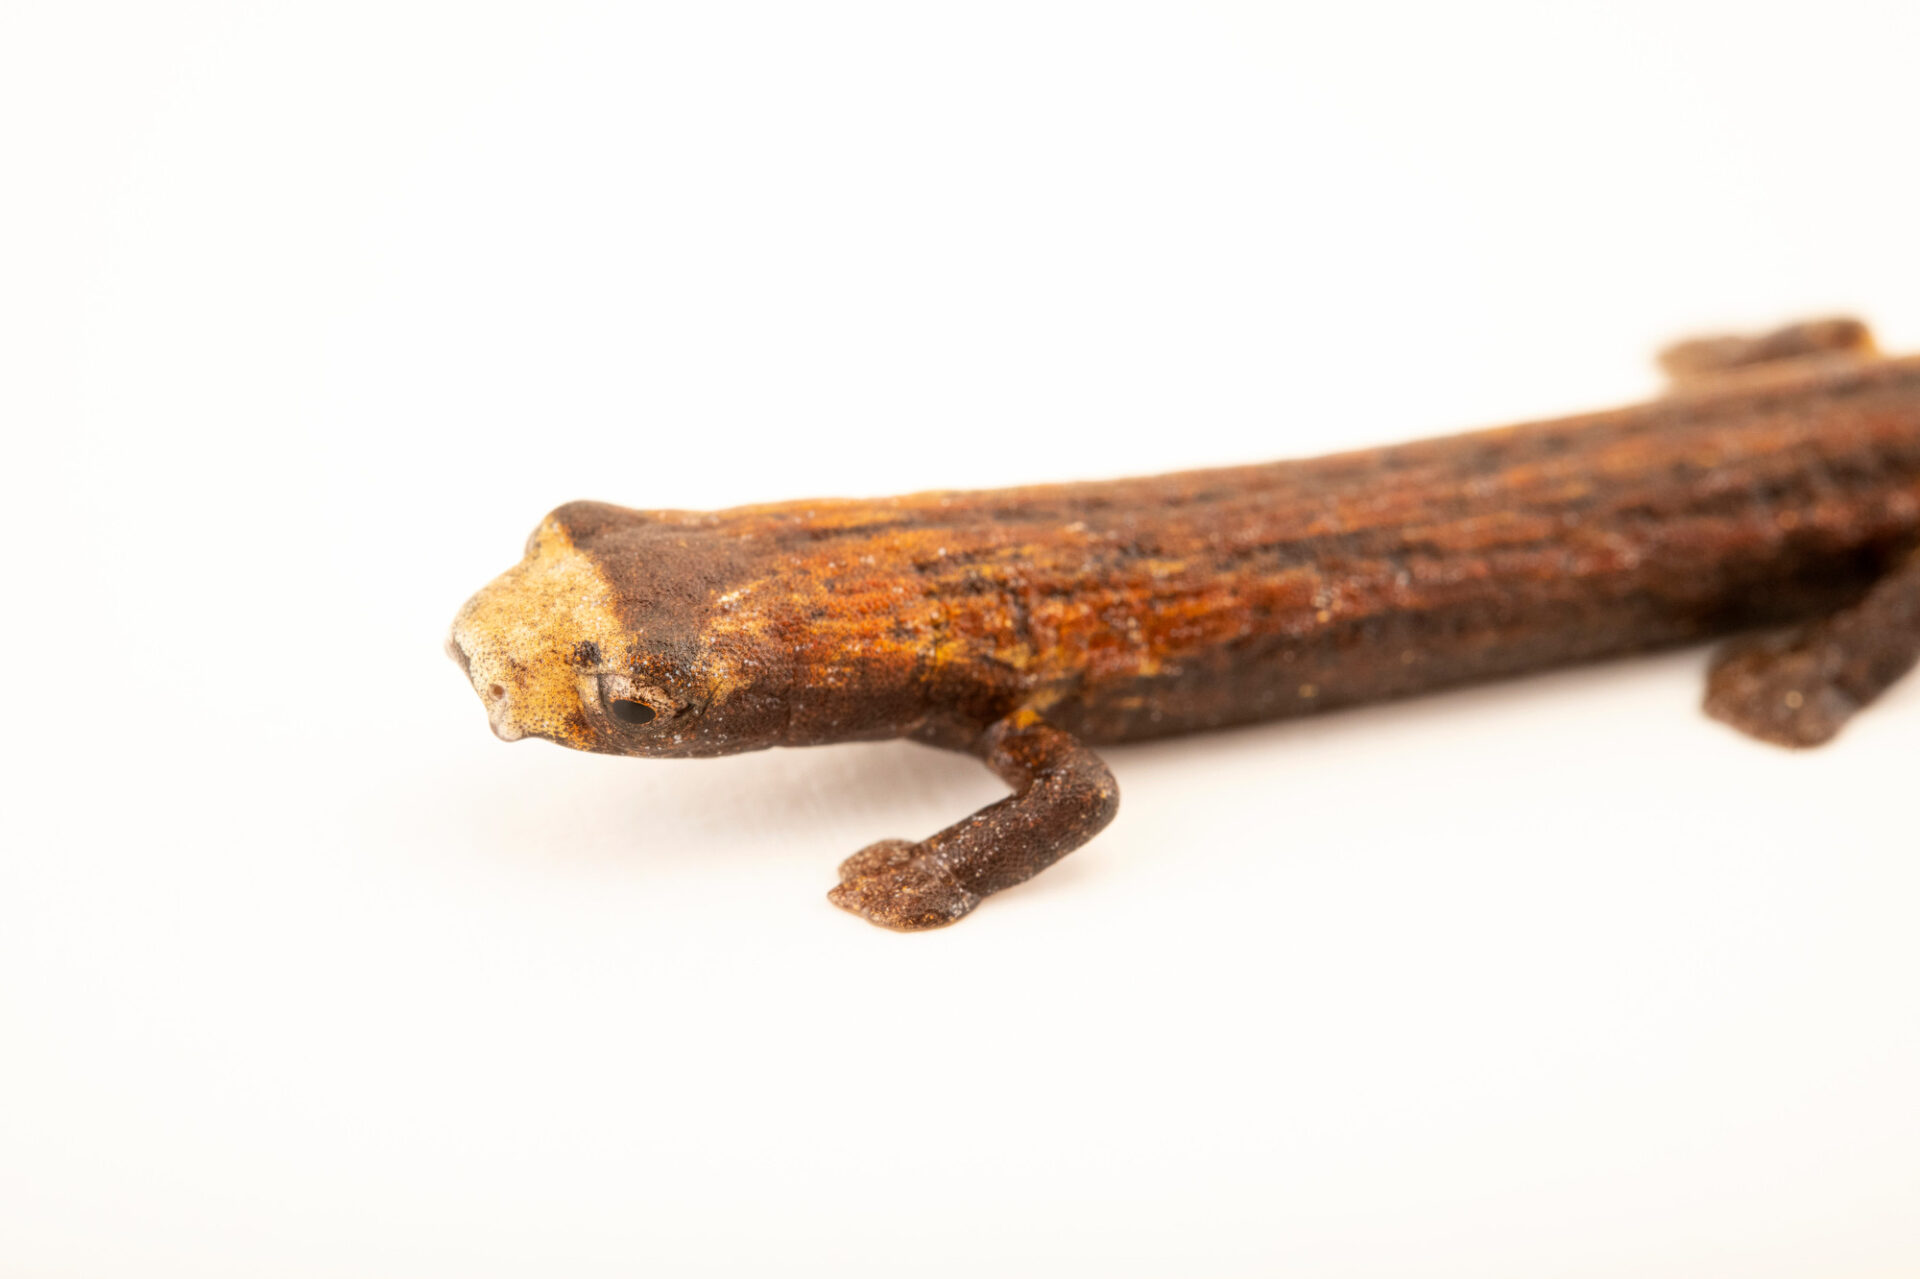 Photo: A Peru mushroom tongue salamander (Bolitoglossa peruviana) at Centro Jambatu in Quito, Ecuador.